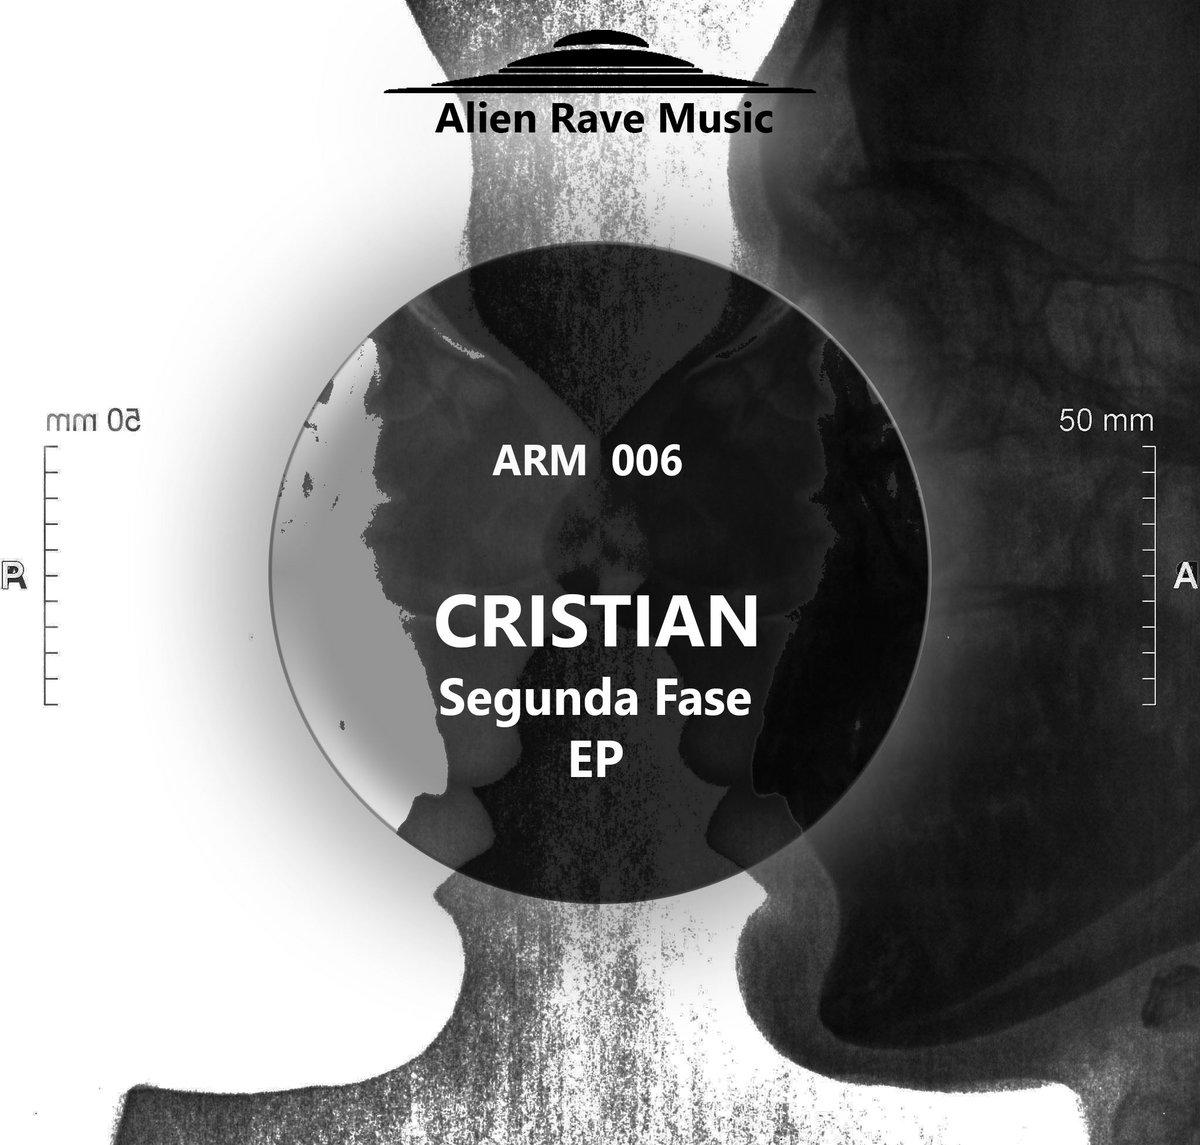 Cristian - Avistamientos (original mix) 130 bpm | Alien Rave